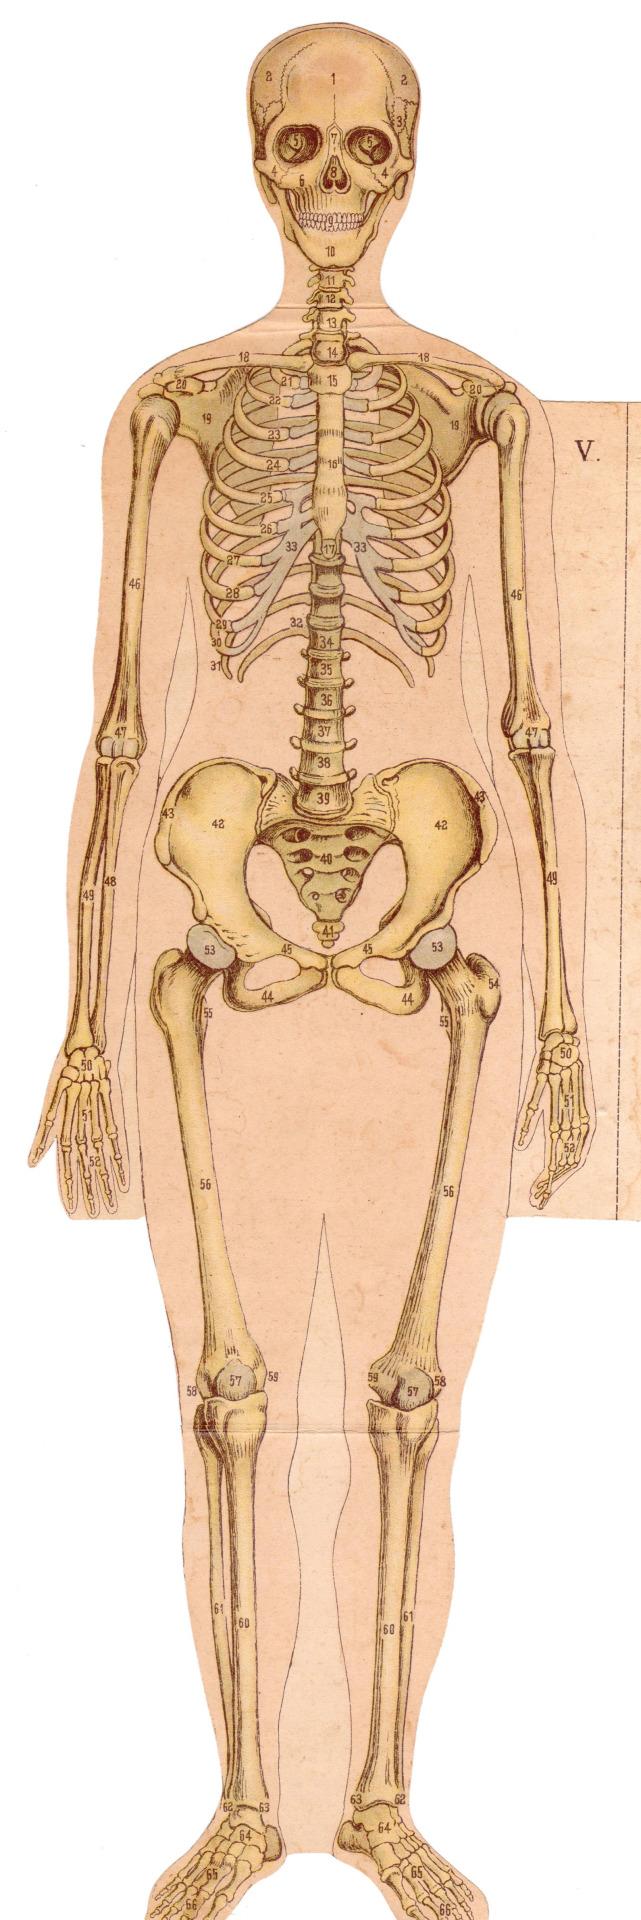 Anatoref Anatomy Illustrations From Late 19th Century